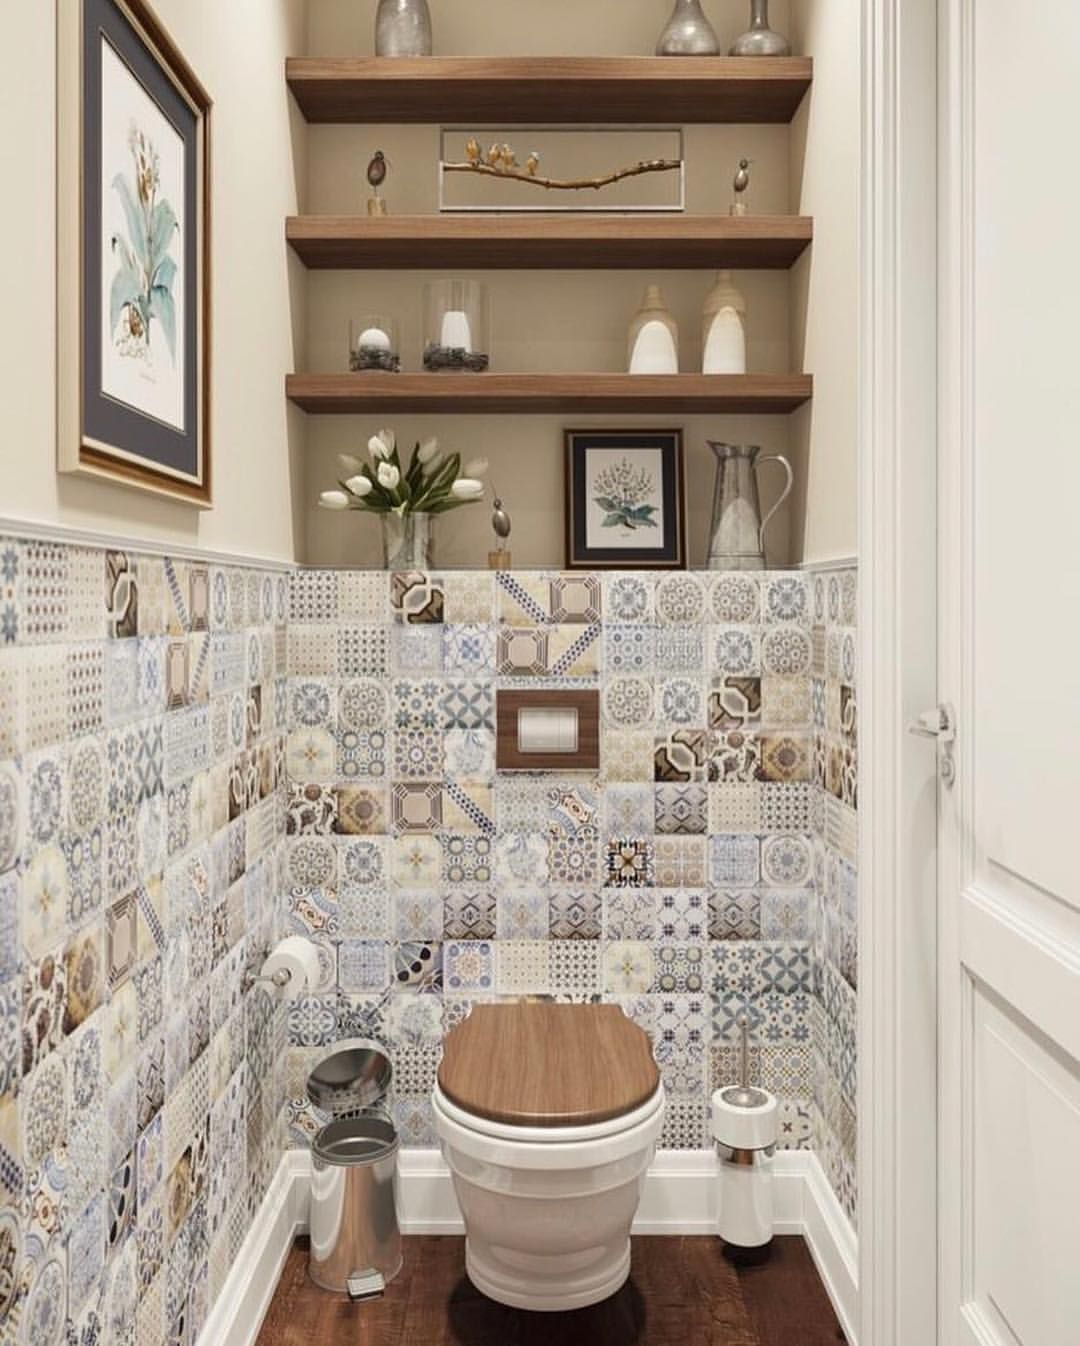 m ge arslano lu adl kullan c n n banyo panosundaki pin. Black Bedroom Furniture Sets. Home Design Ideas